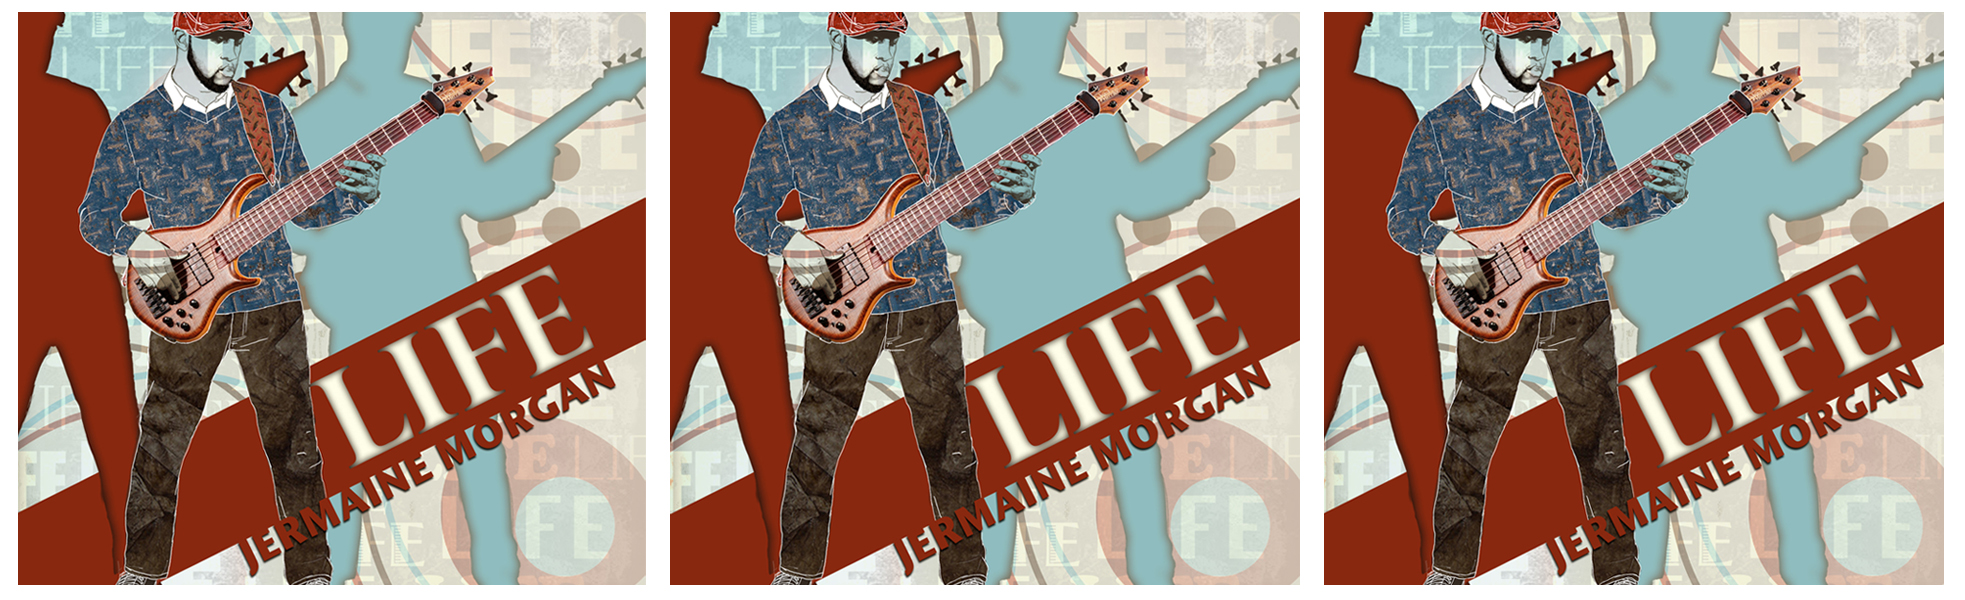 The Artist – Jermaine Morgan| the Bassist